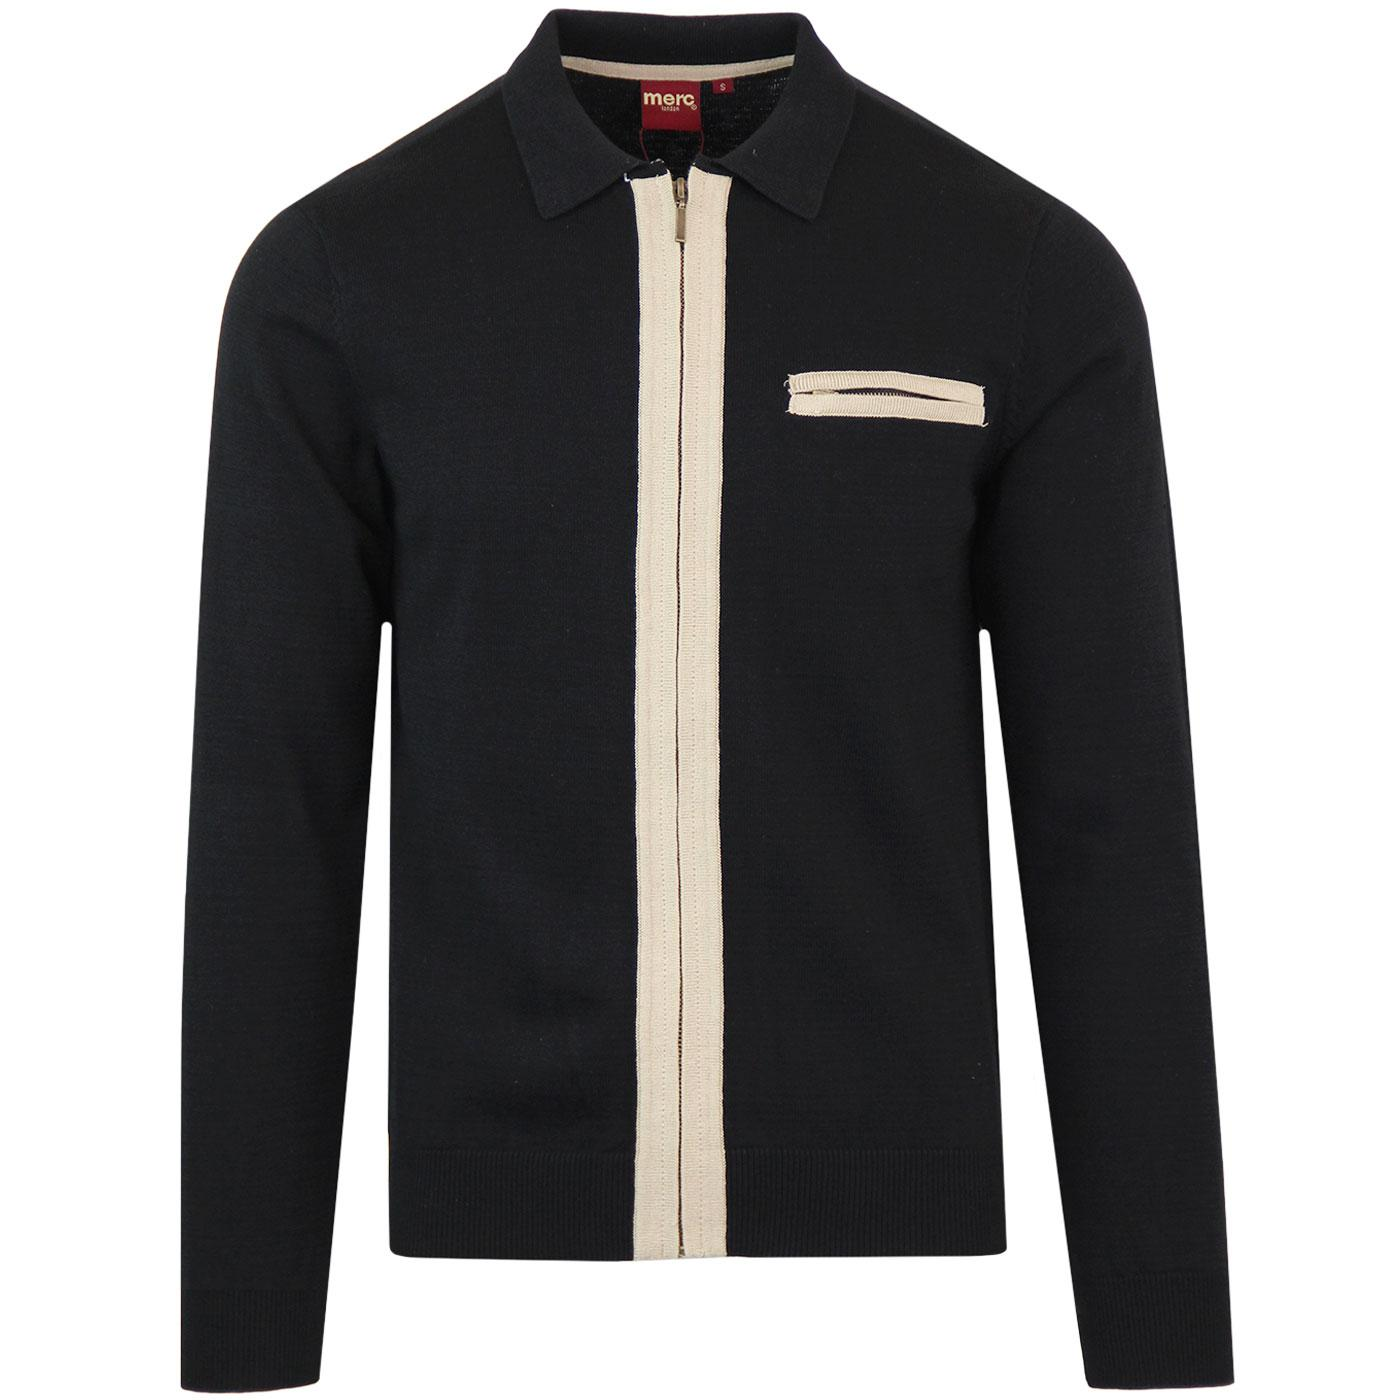 Belsize MERC Retro Mod Contrast Zip Polo Cardigan